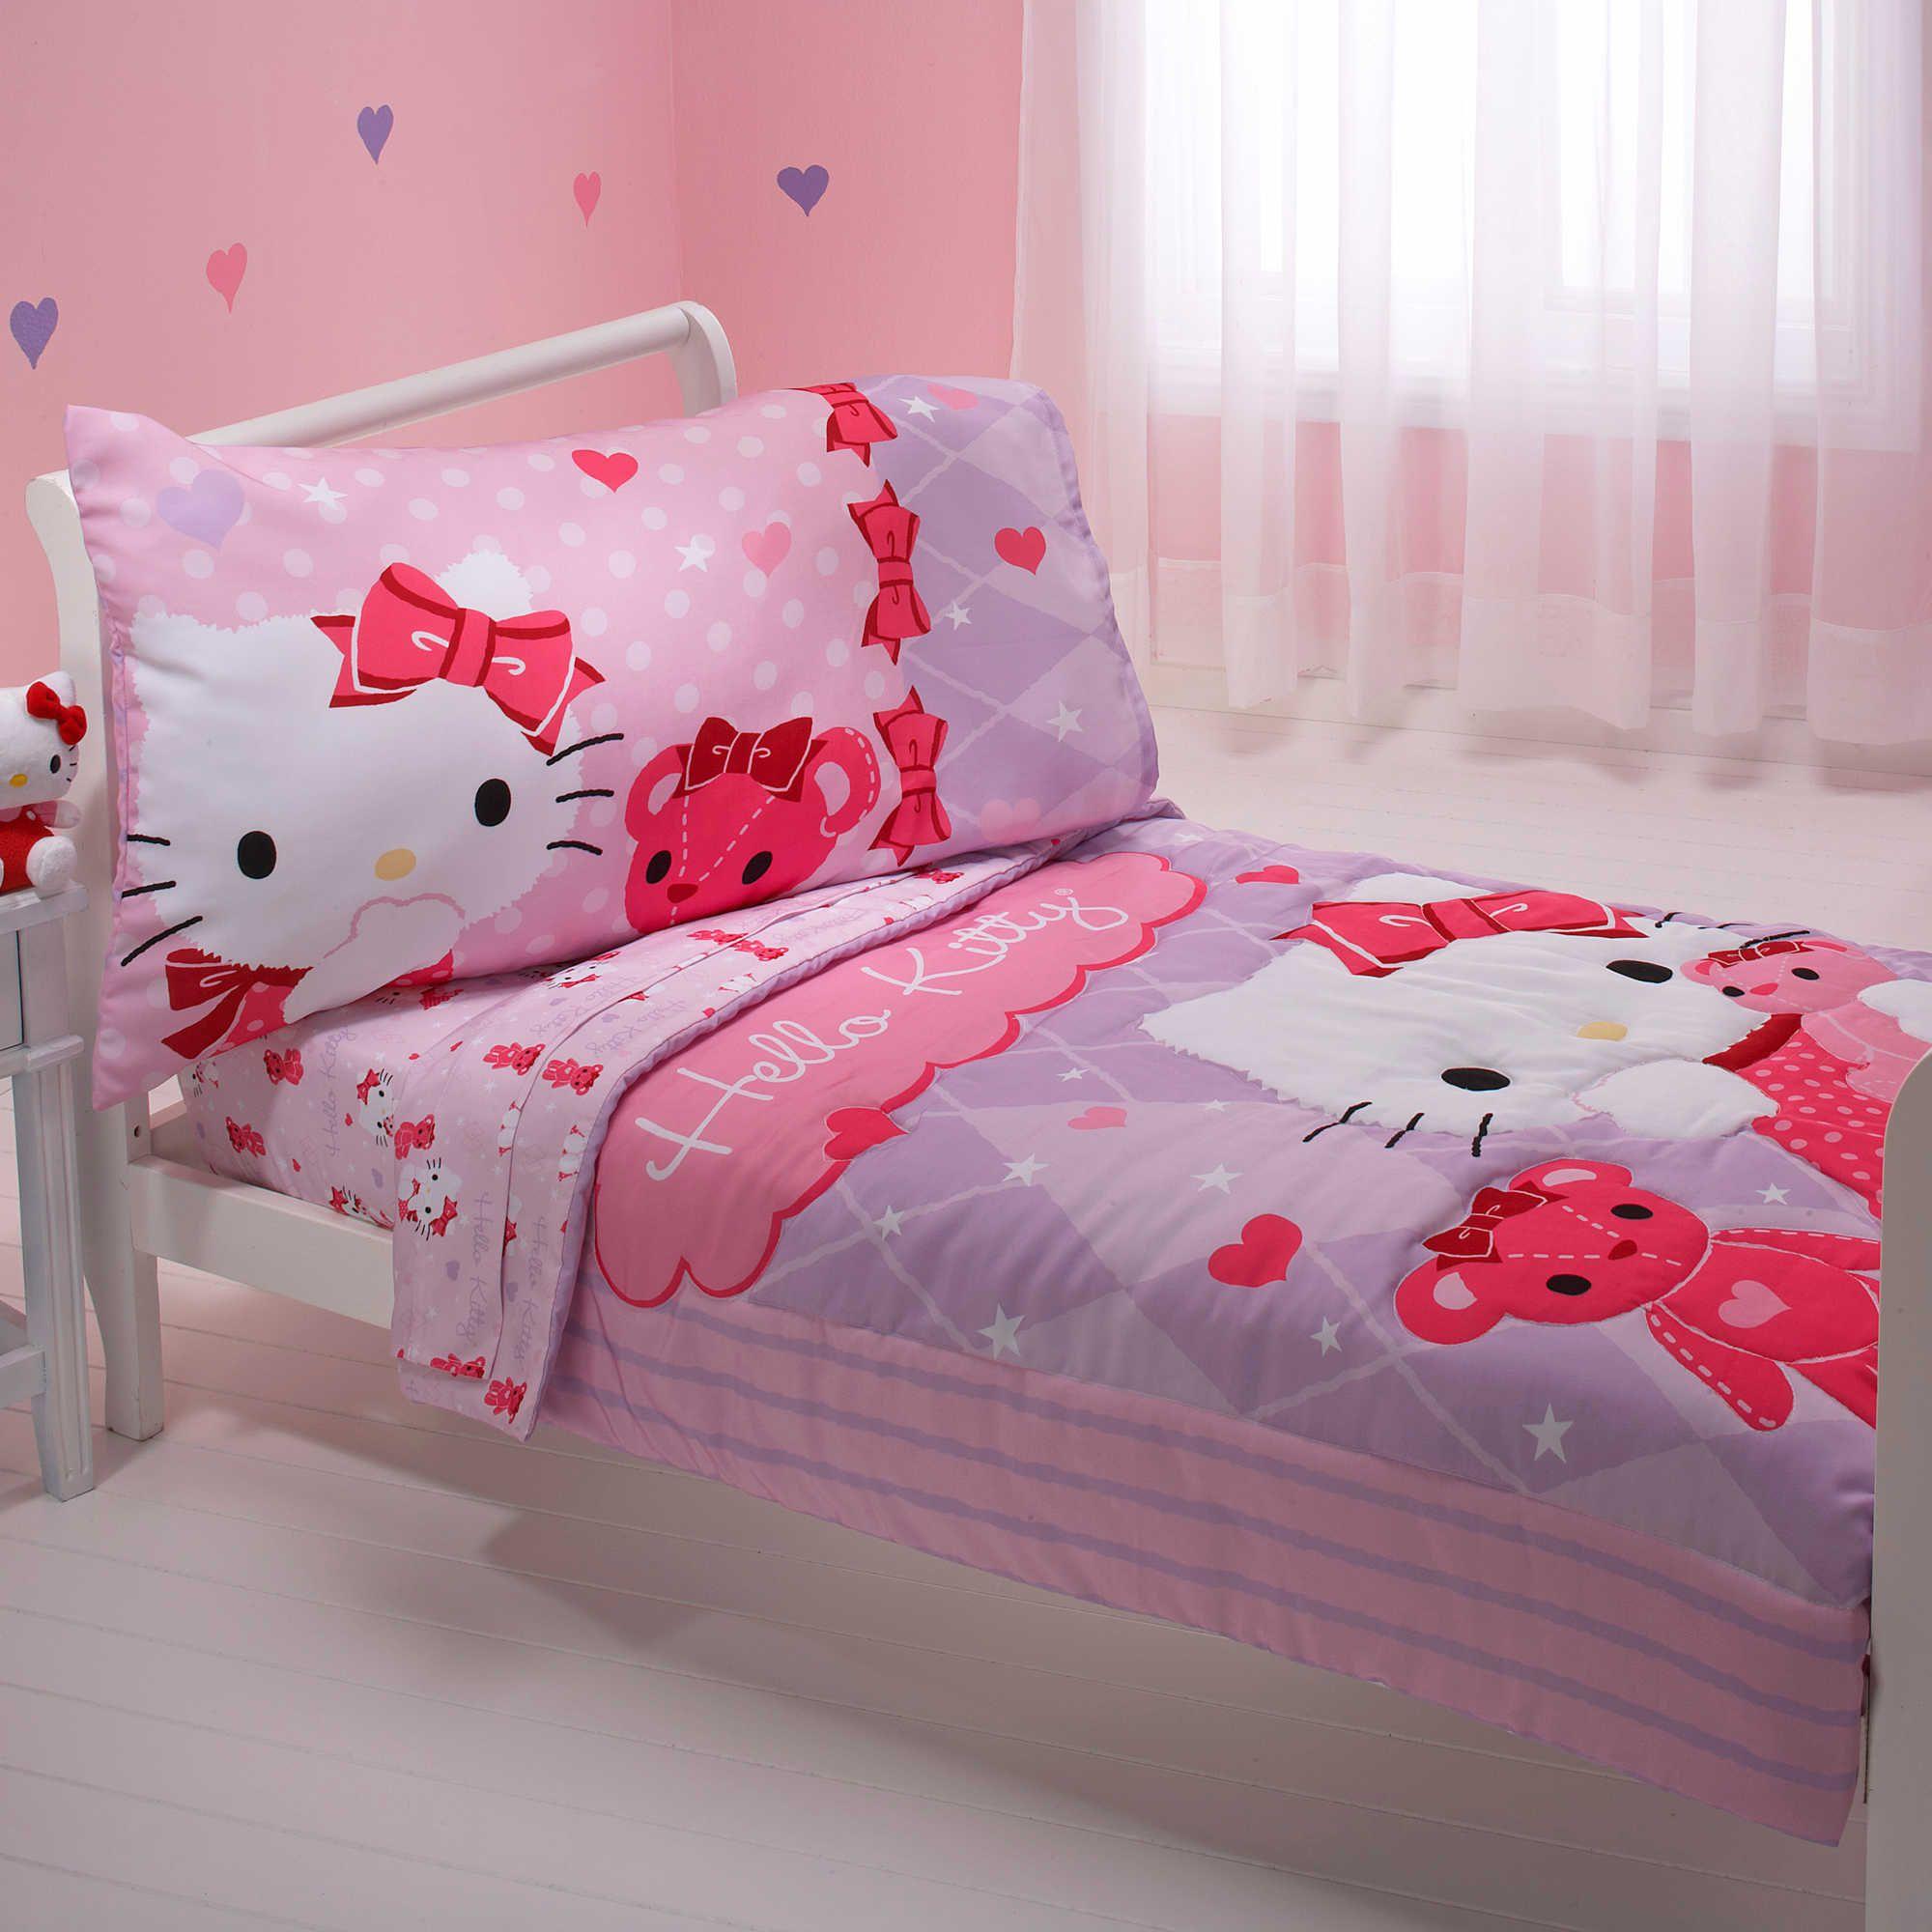 Hello Kitty Amp Friends 4 Piece Toddler Bedding Set